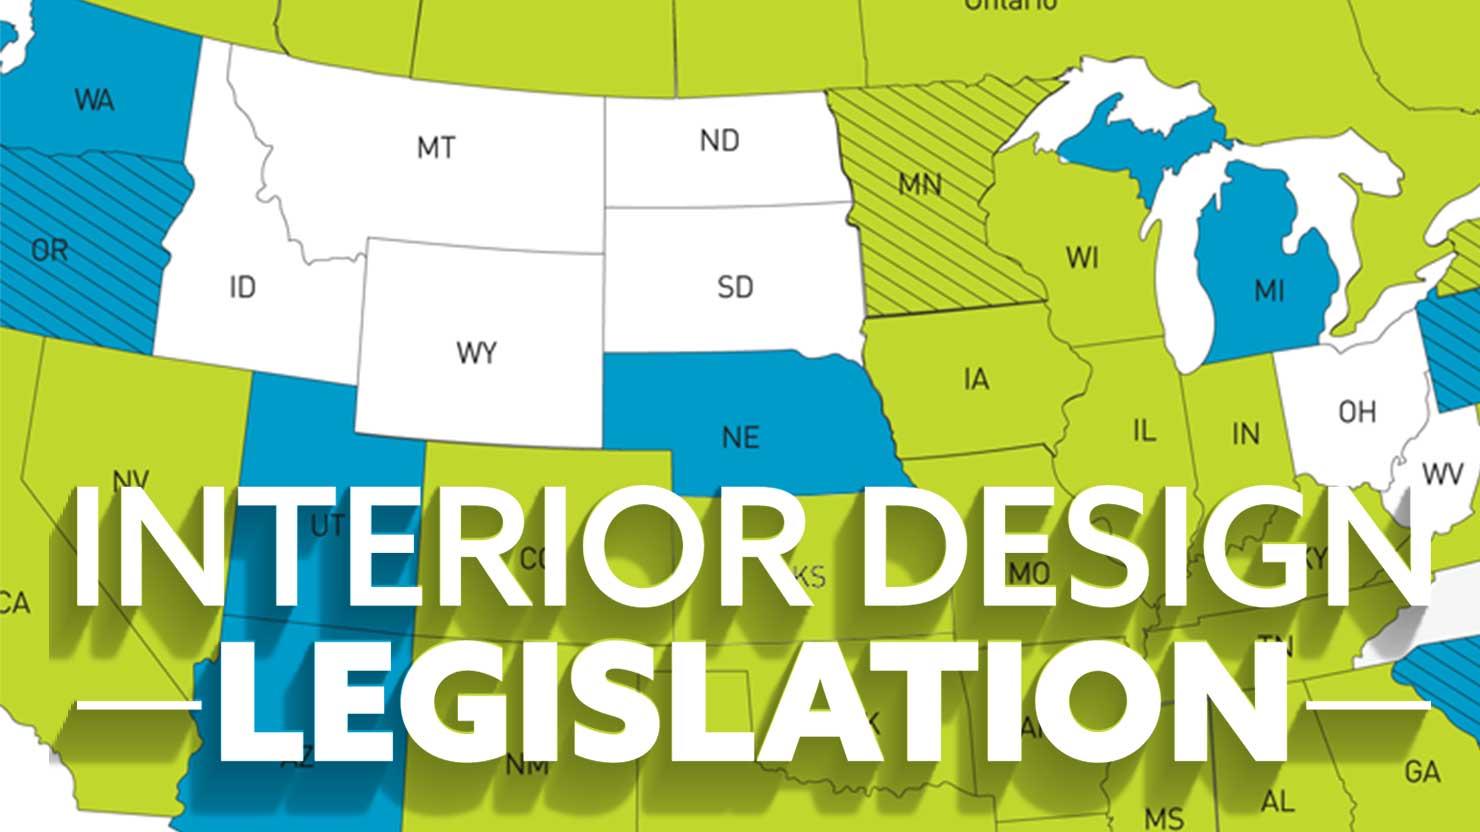 Why Have NCIDQ or Interior Design Legislation